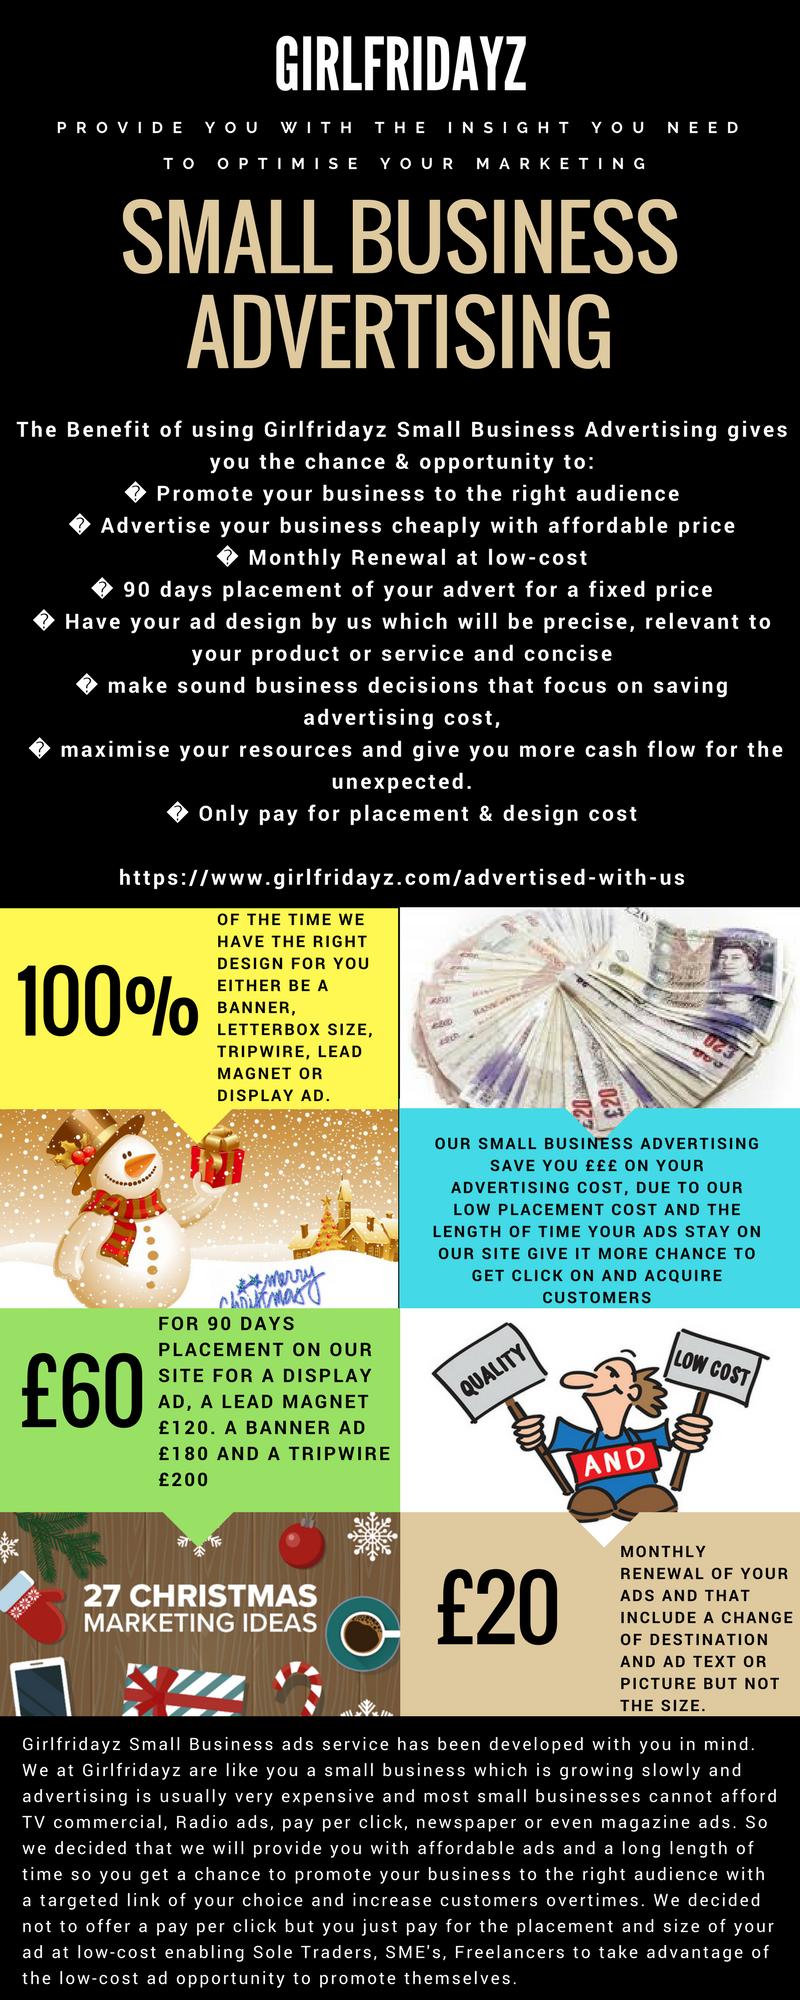 Girlfridayz Small Business Advertising